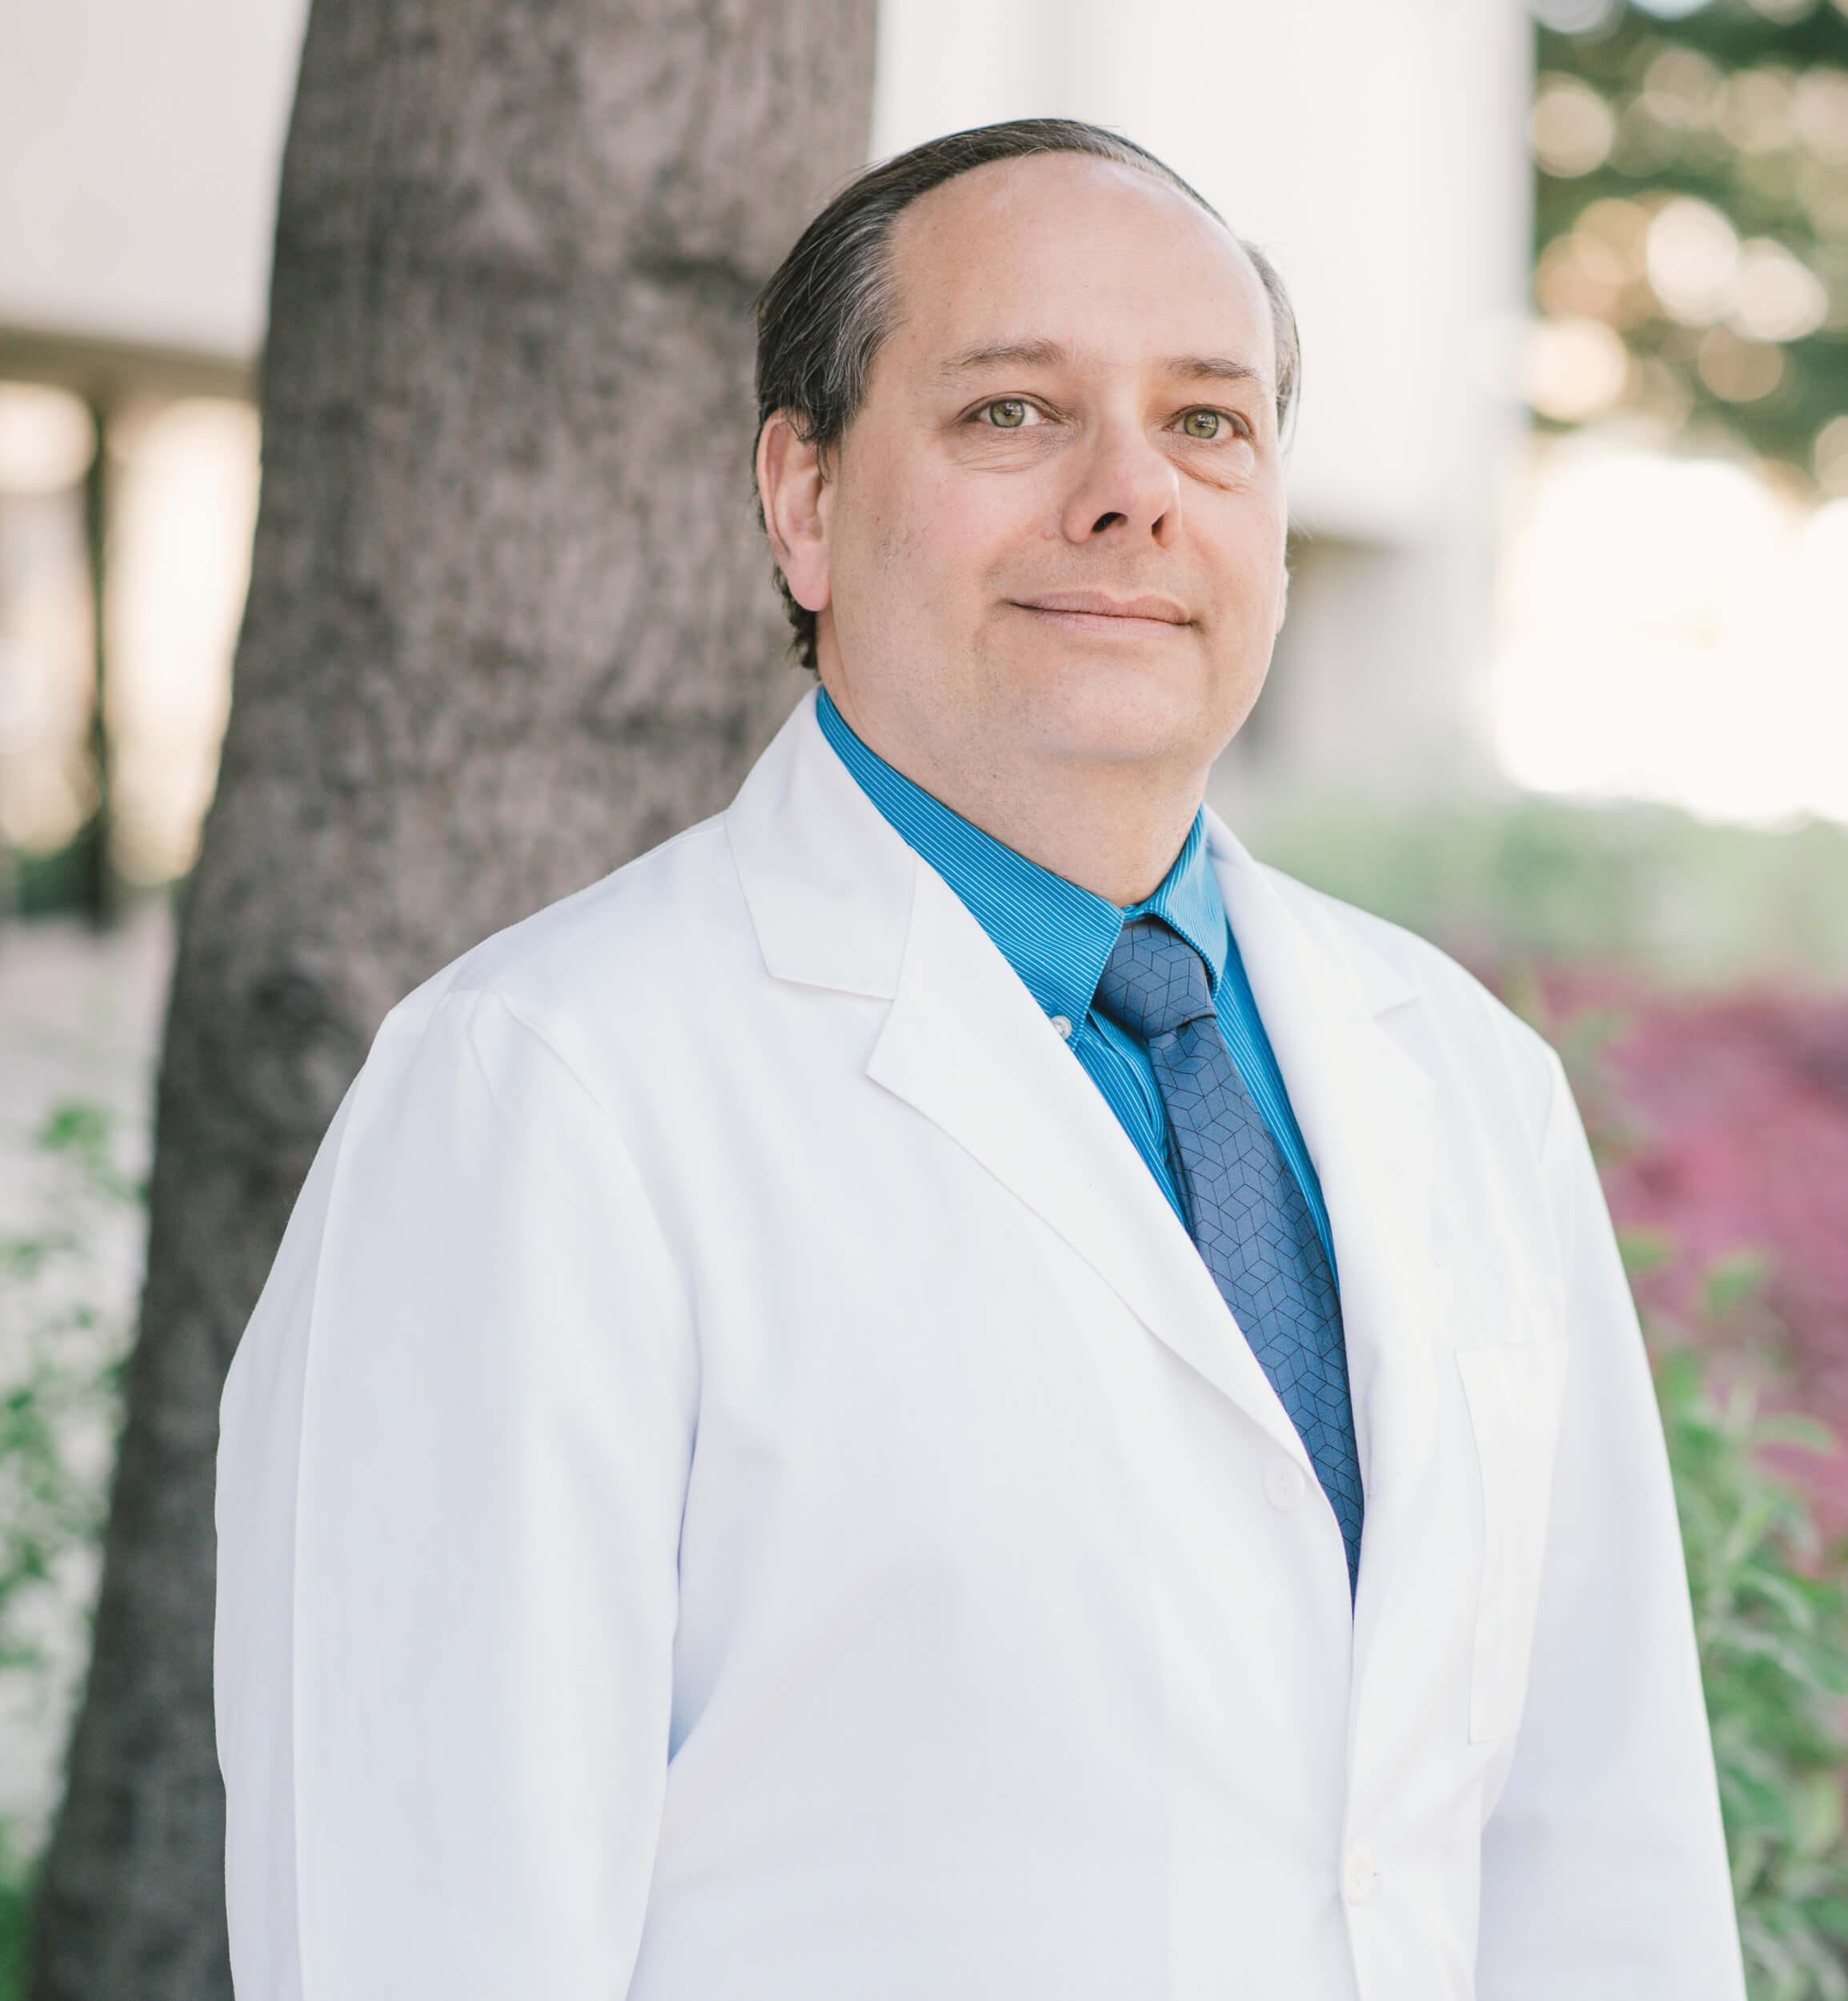 Scott A. Lipson, M.D.